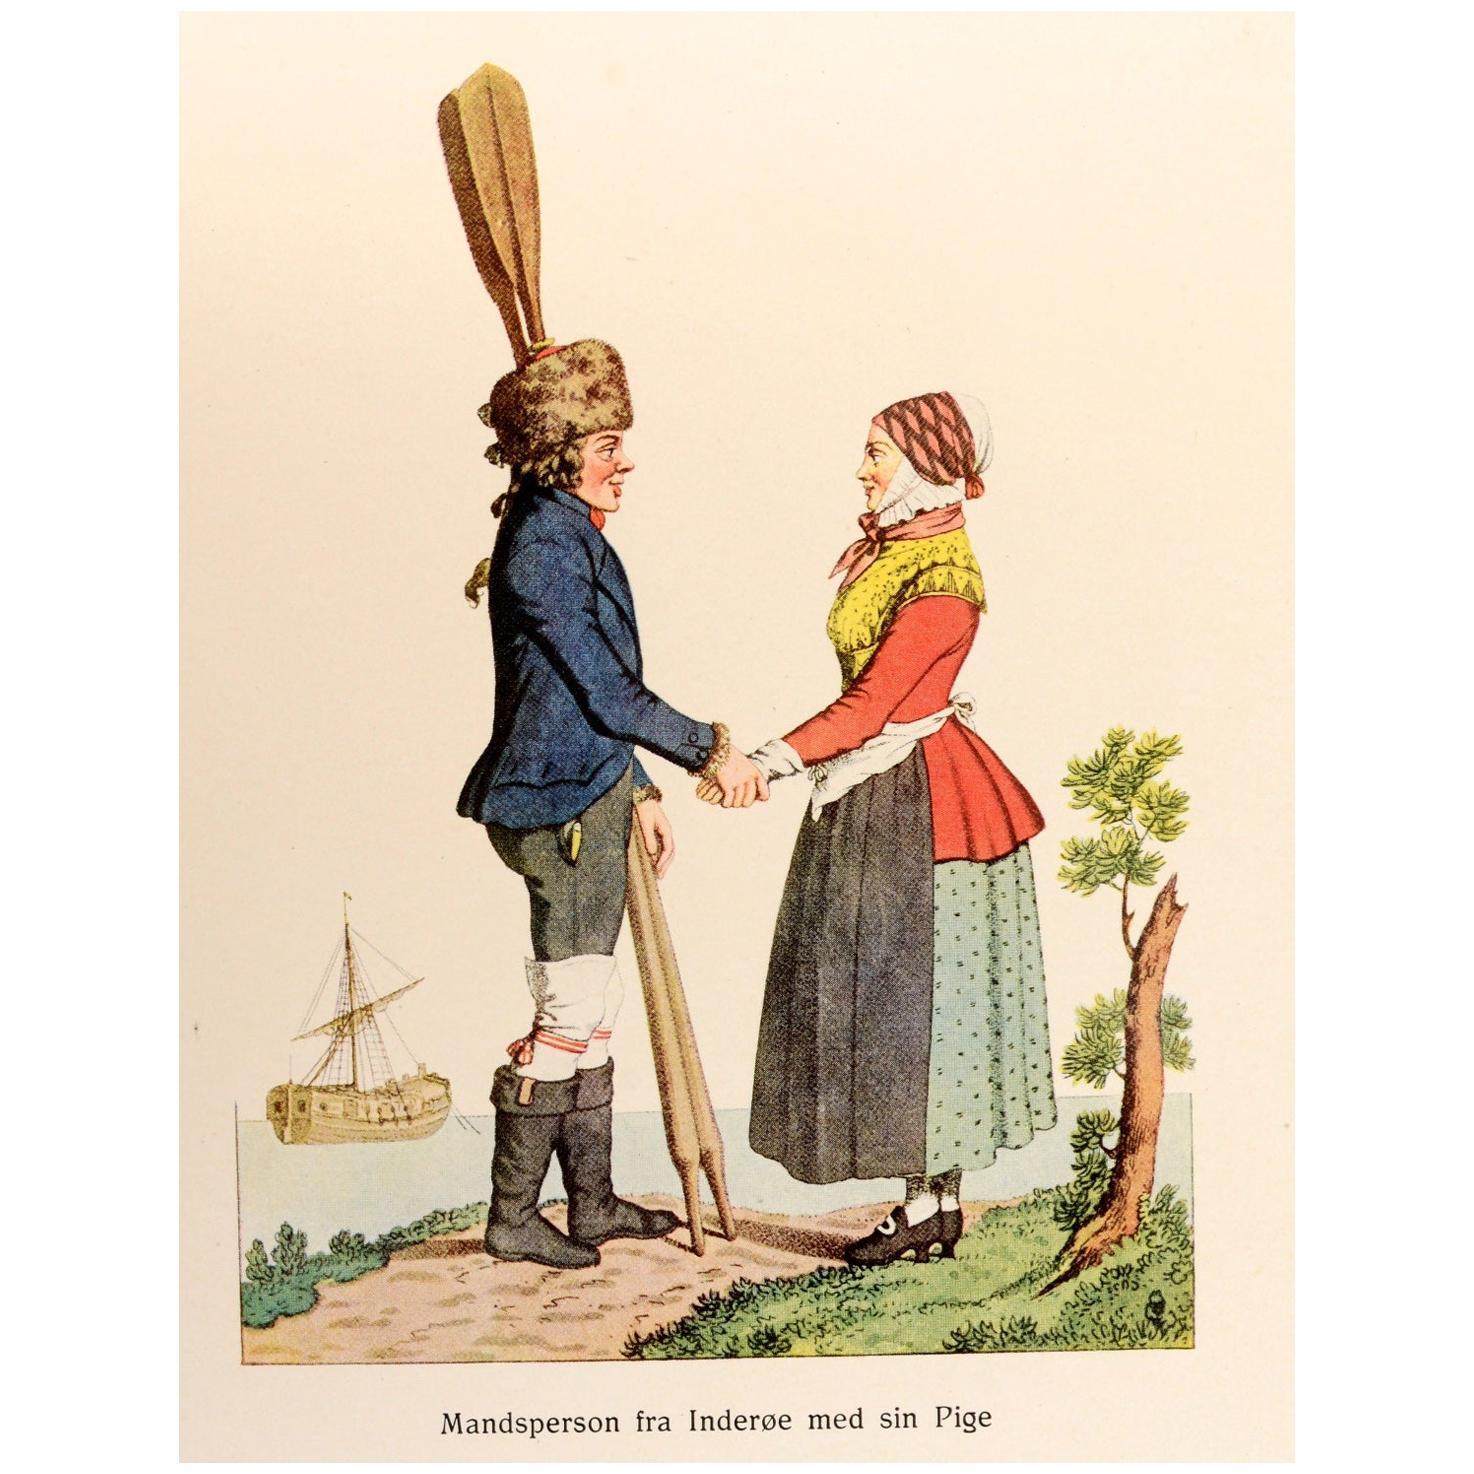 Norwegian Folk Costumes 'Norske Folkedragter' 1st Edition